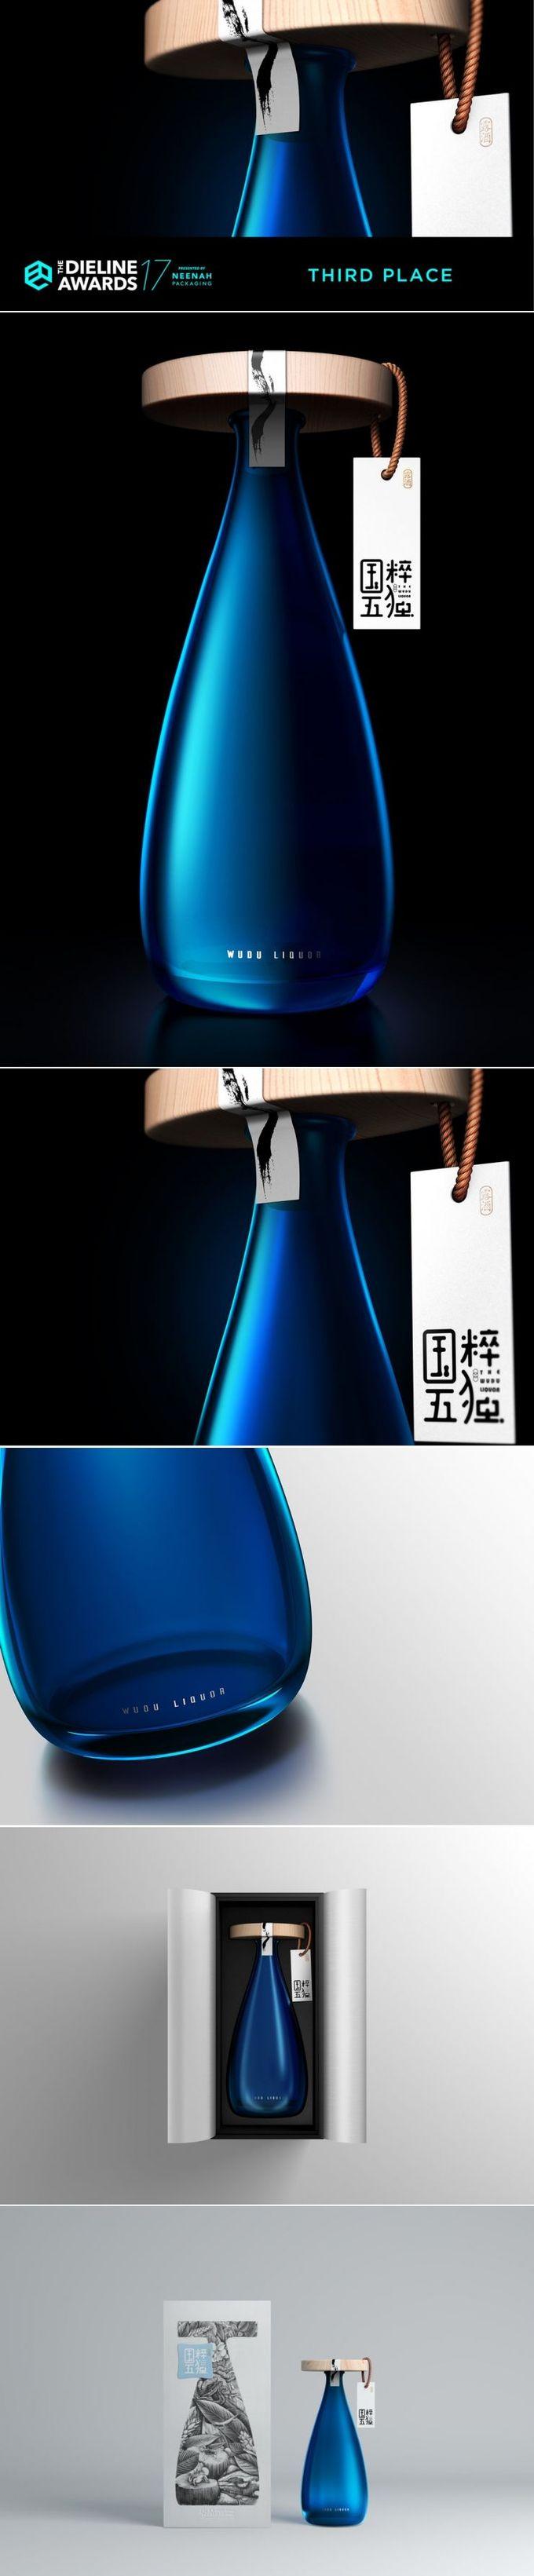 The Dieline Awards 2017: Guo Cui WuDu Liquor — The Dieline | Packaging & Branding Design & Innovation News